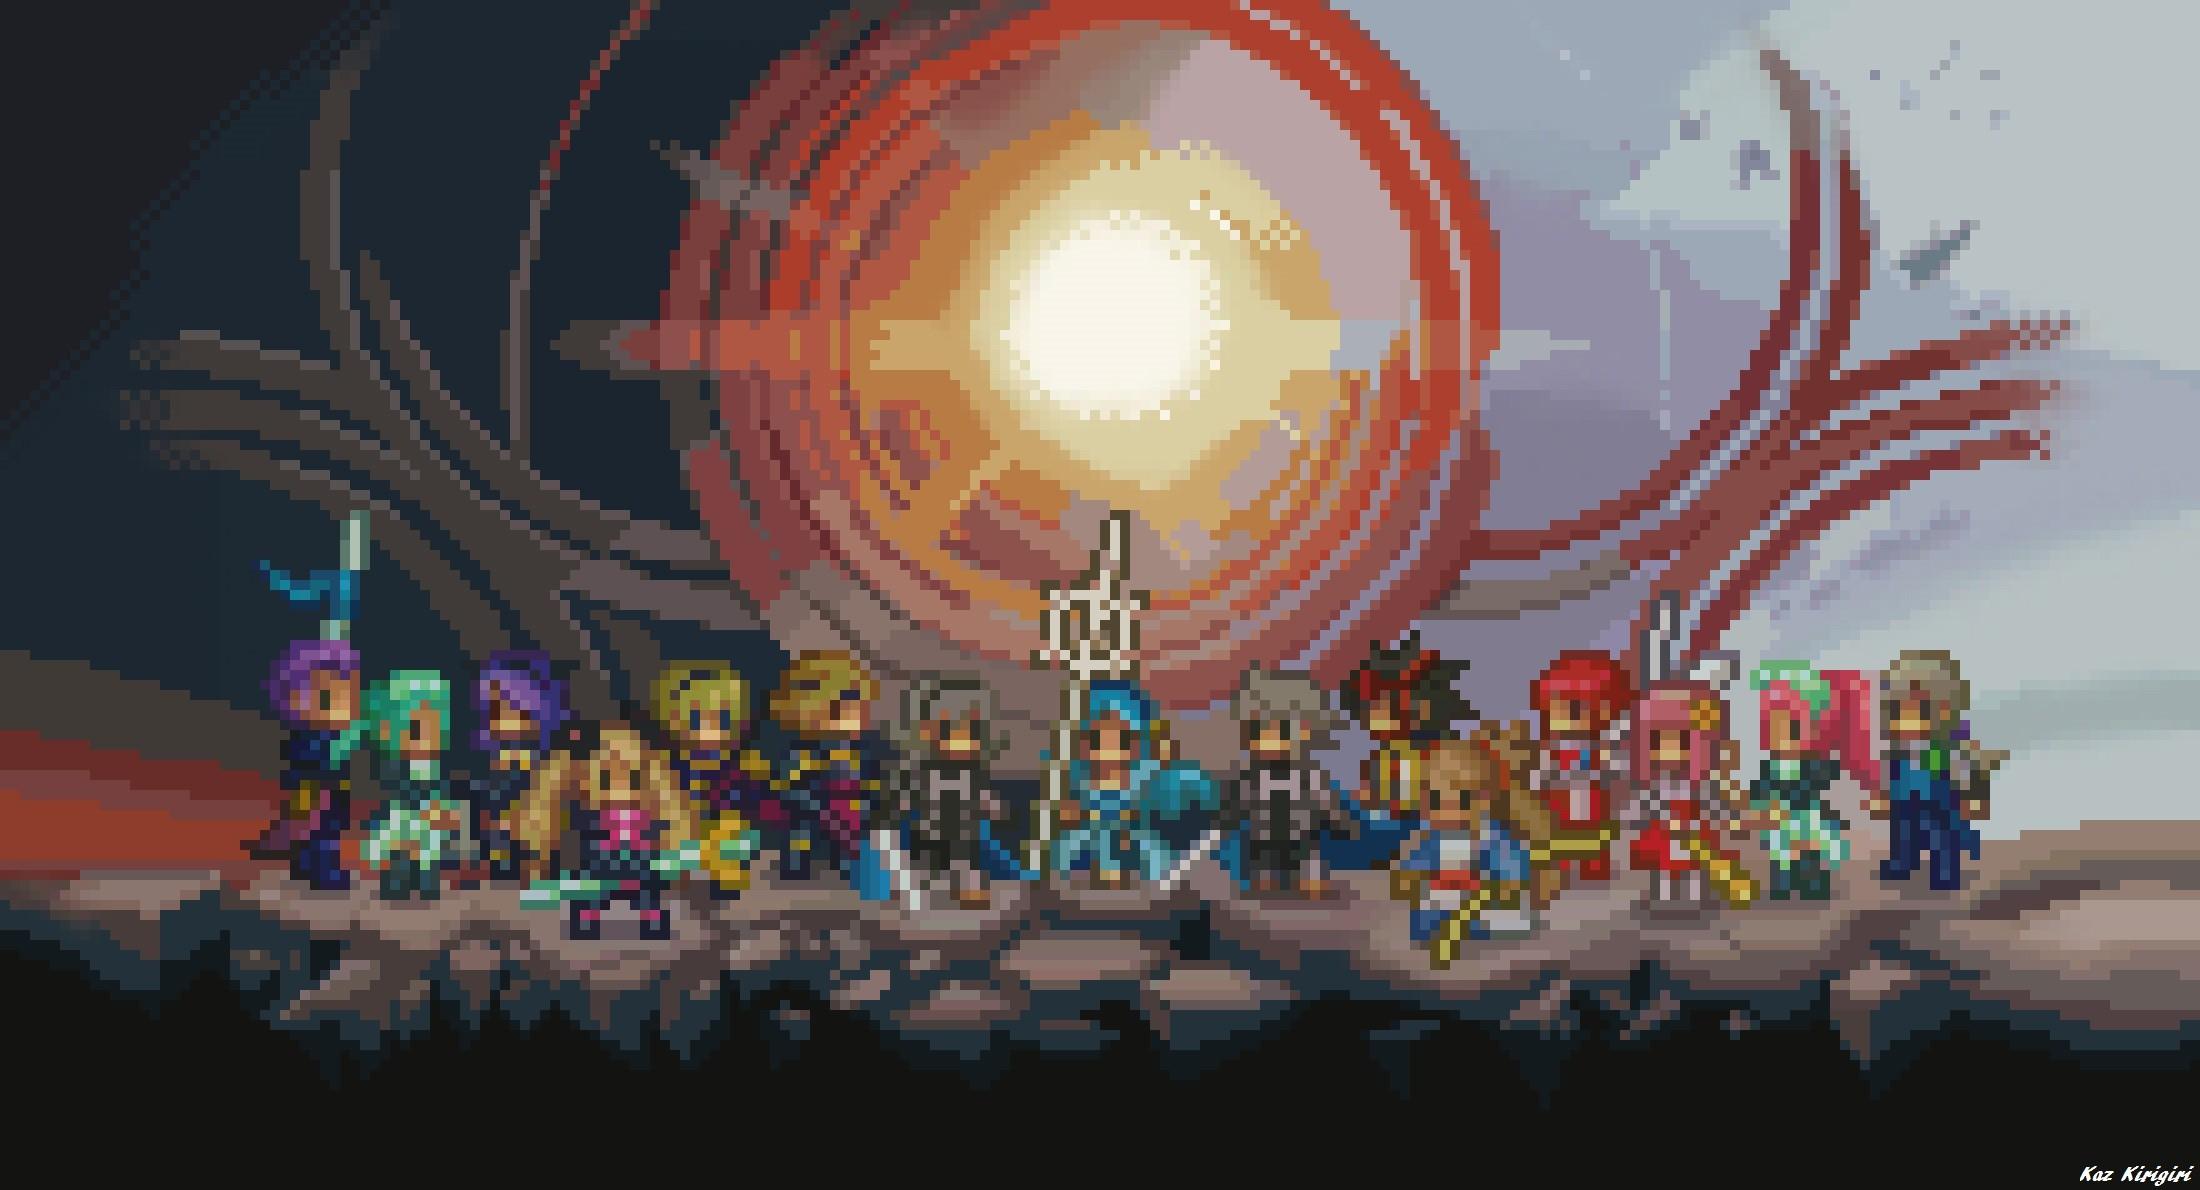 … Fire Emblem Fates Pixel Art Wallpaper by Kaz-Kirigiri